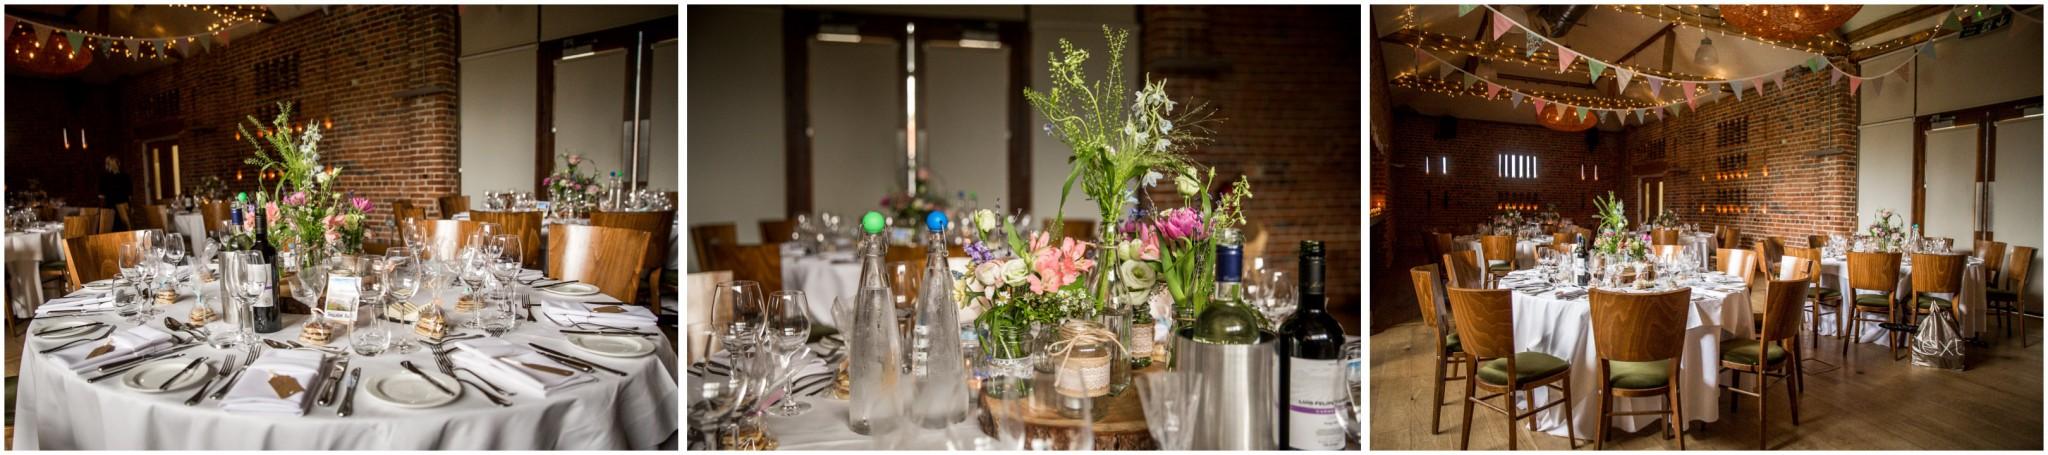 Wasing Park Wedding Photography Barn reception